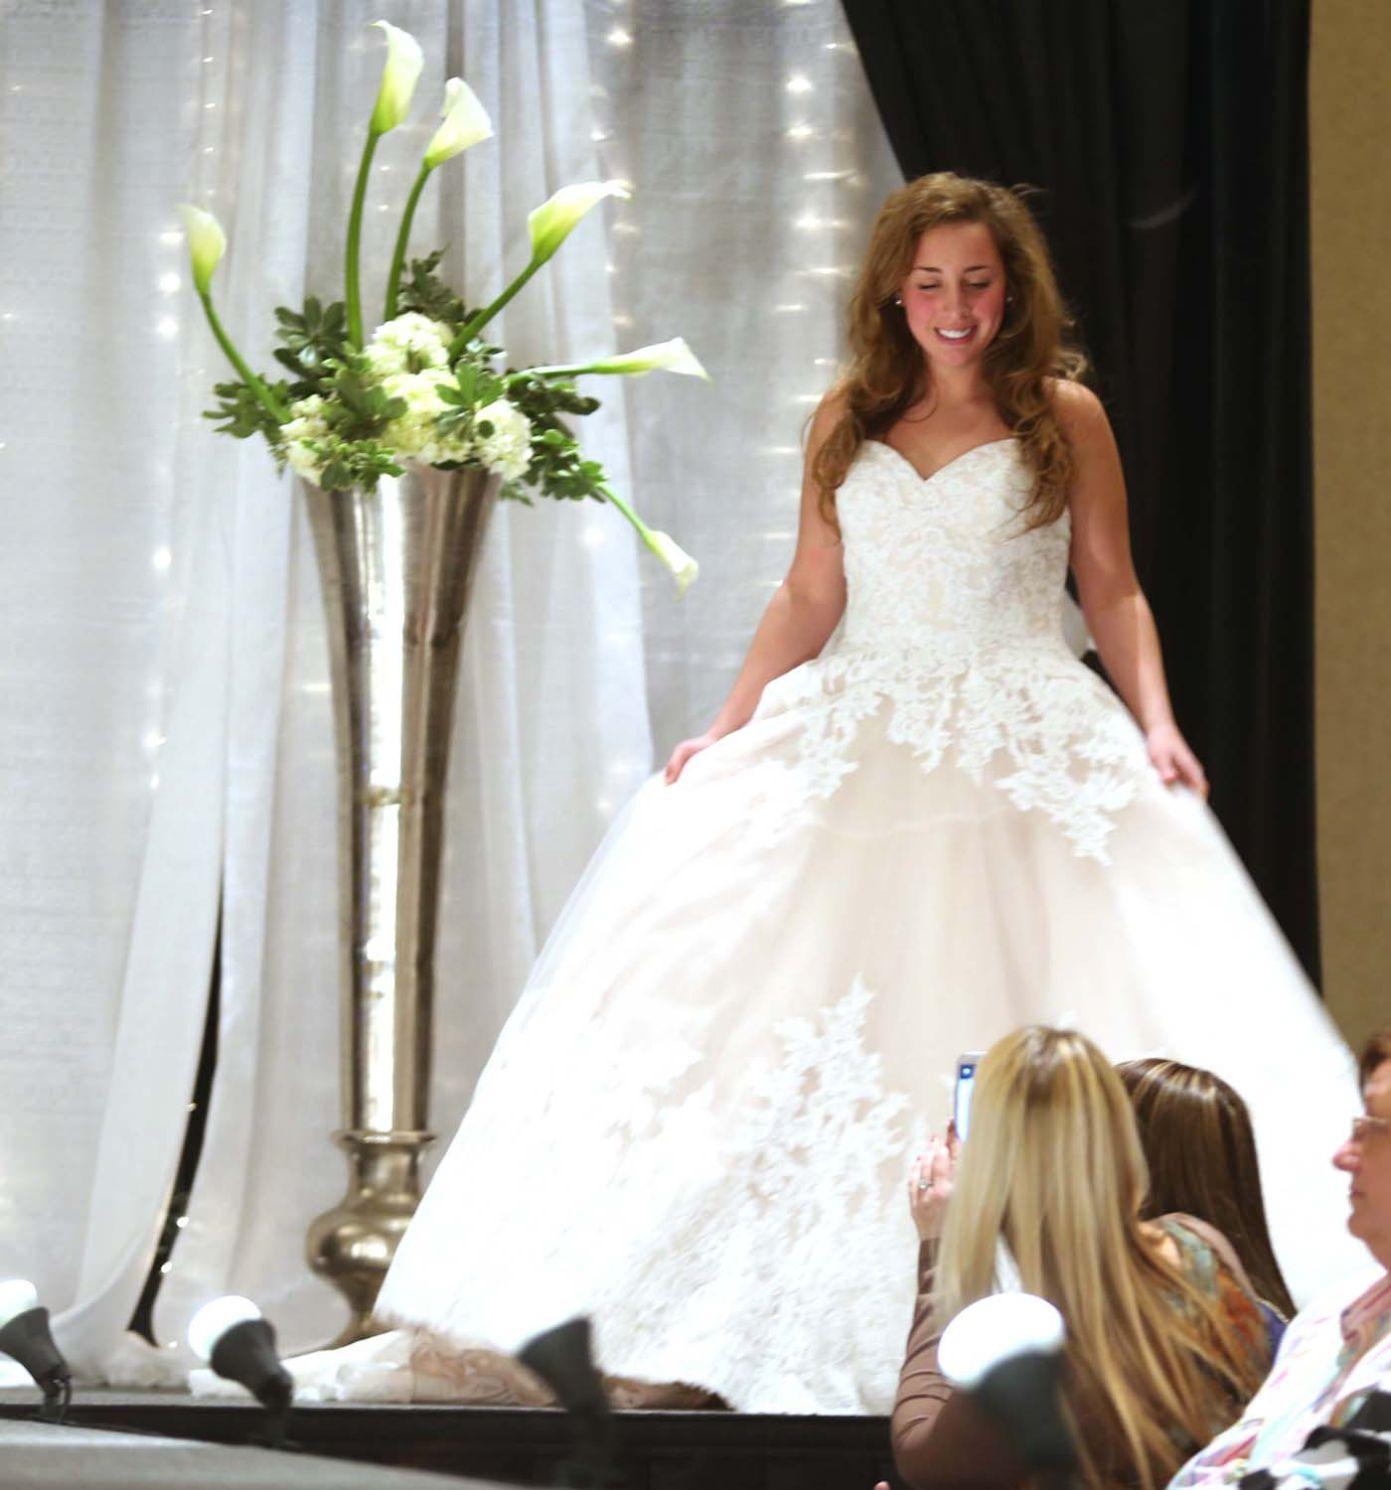 Courtney cason wedding dress images